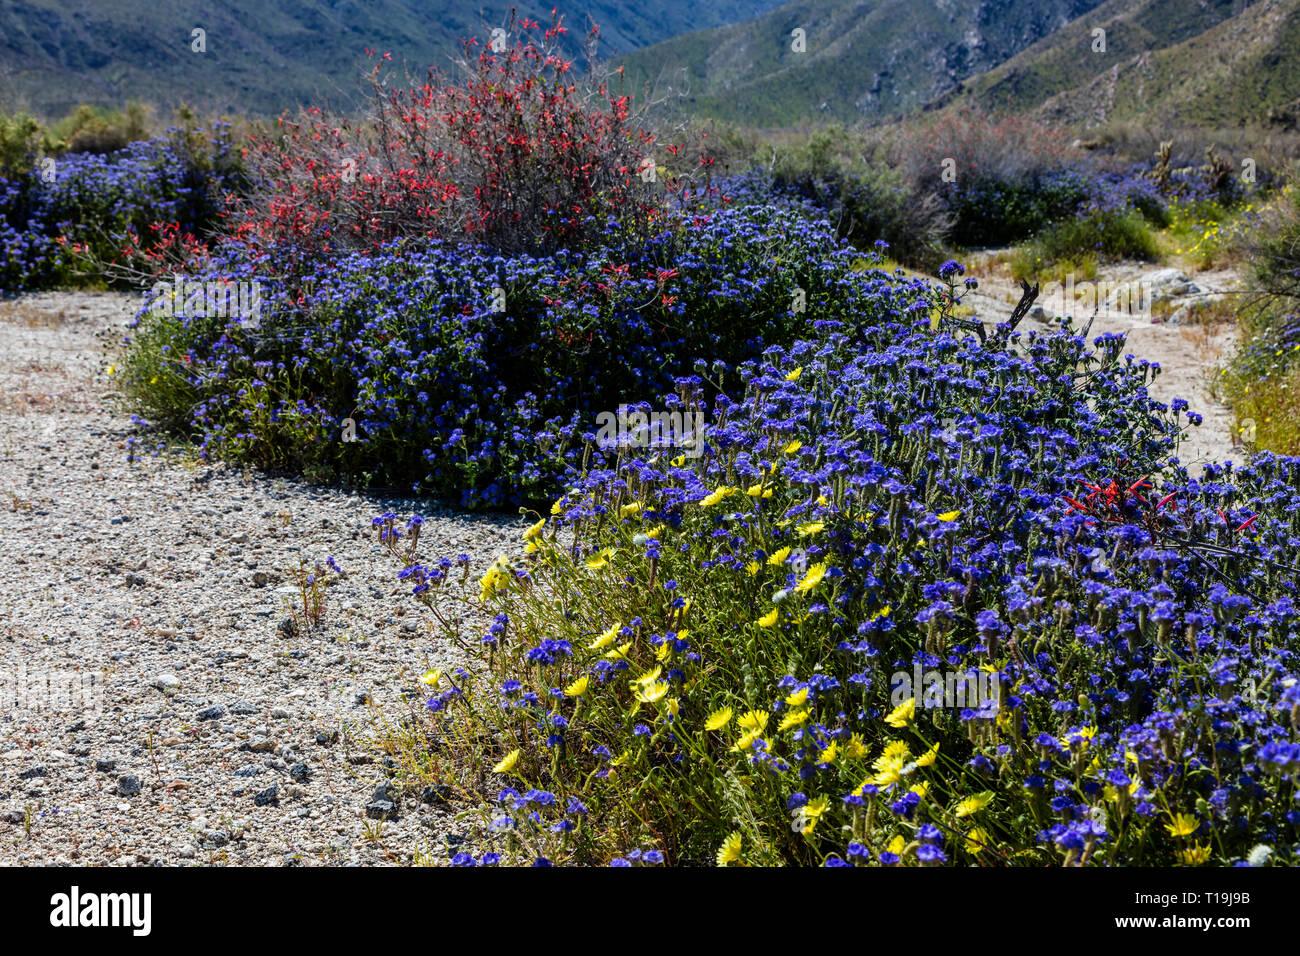 BLUE PHACELIA (Phacelia distans) & CHUPAROSA (Justicia californica) during a superbloom - ANZA BORREGO DESERT STATE PARK, CALIFORNIA - Stock Image